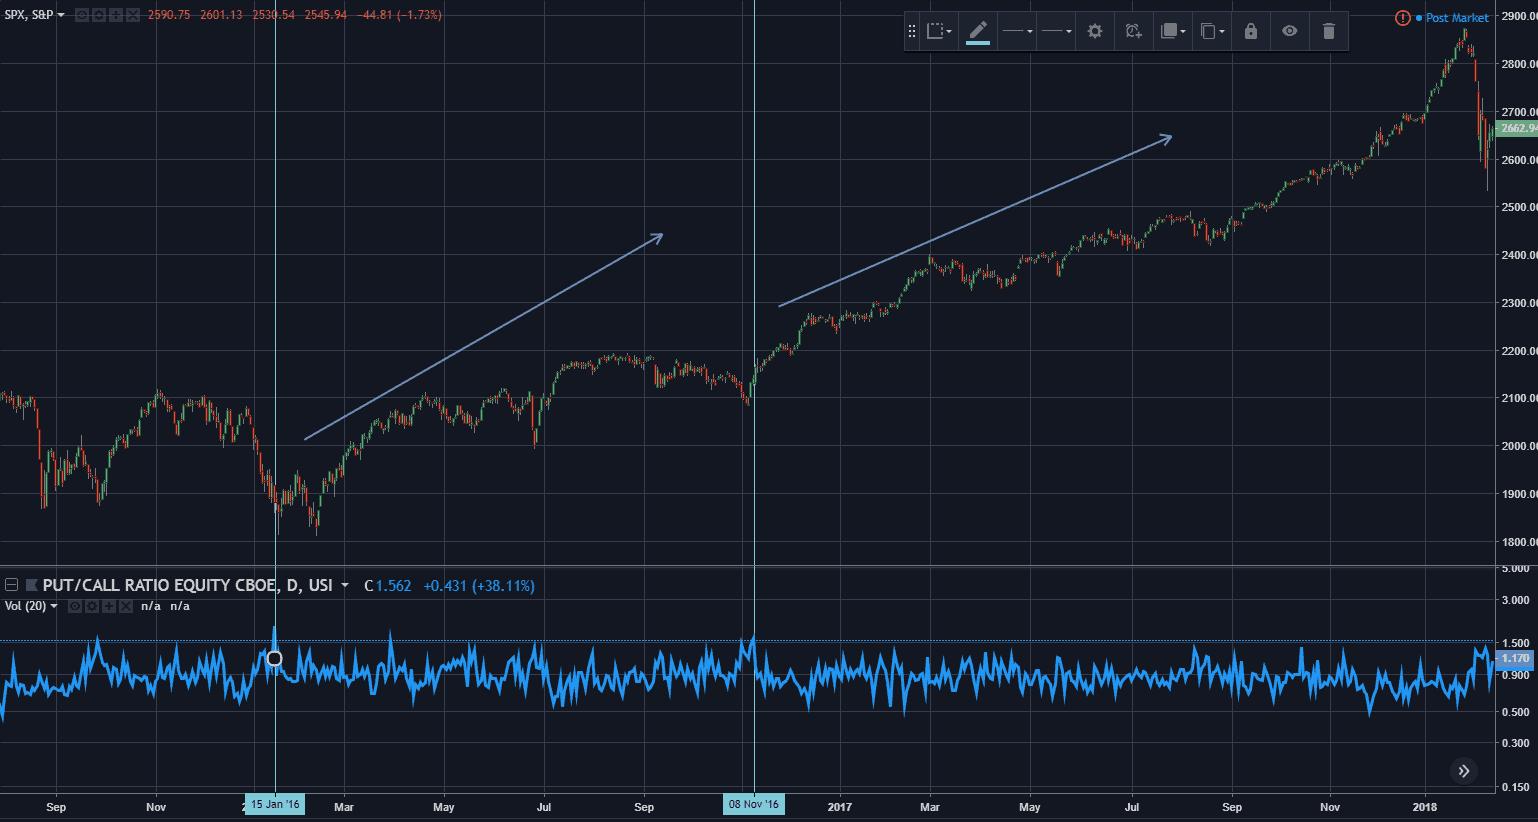 S&P500 Put Call Ratio